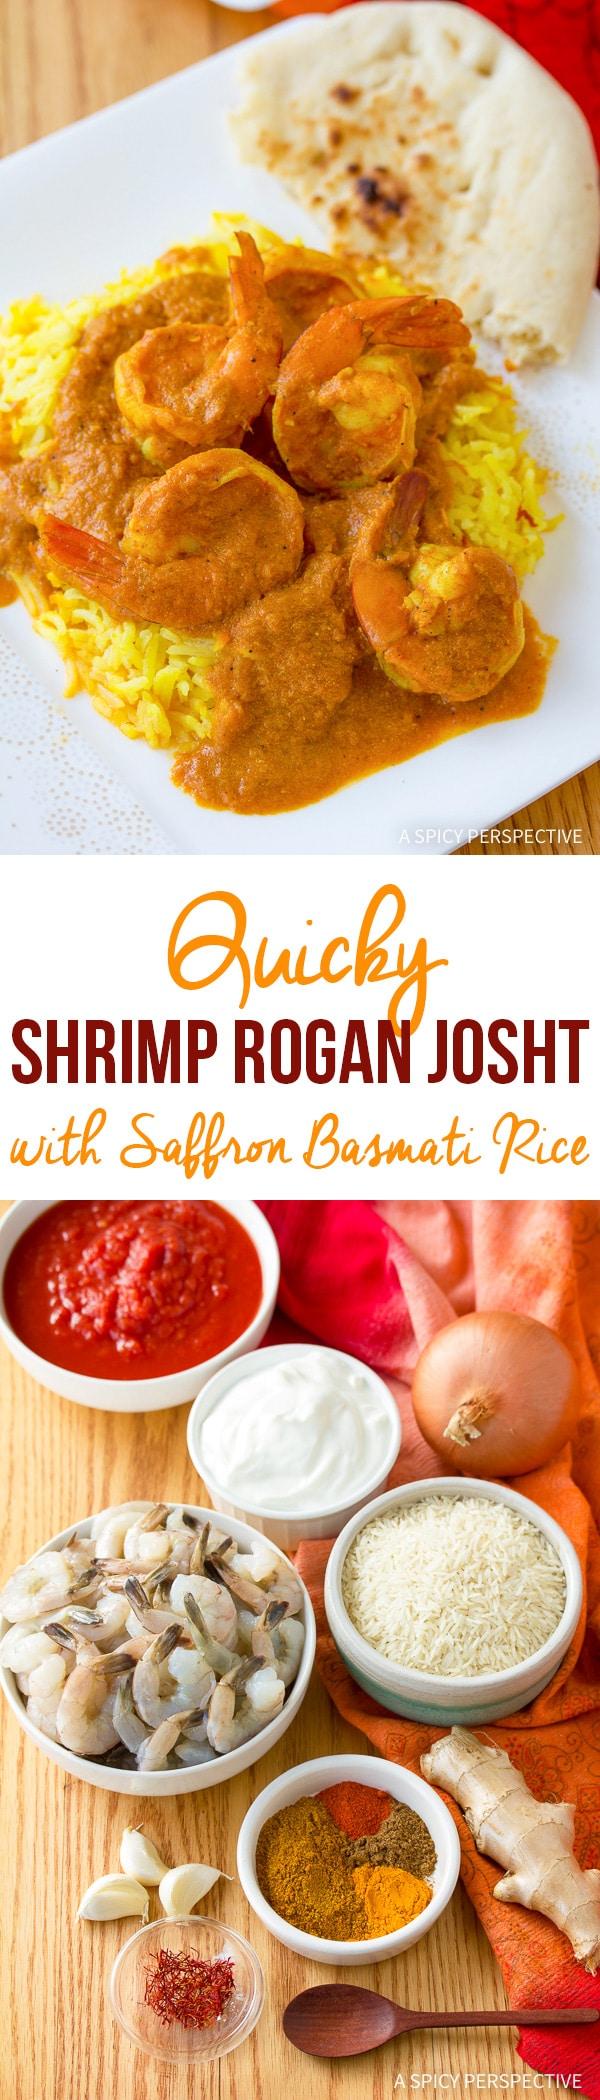 Quick Shrimp Rogan Josht with Saffron Basmati Rice Recipe